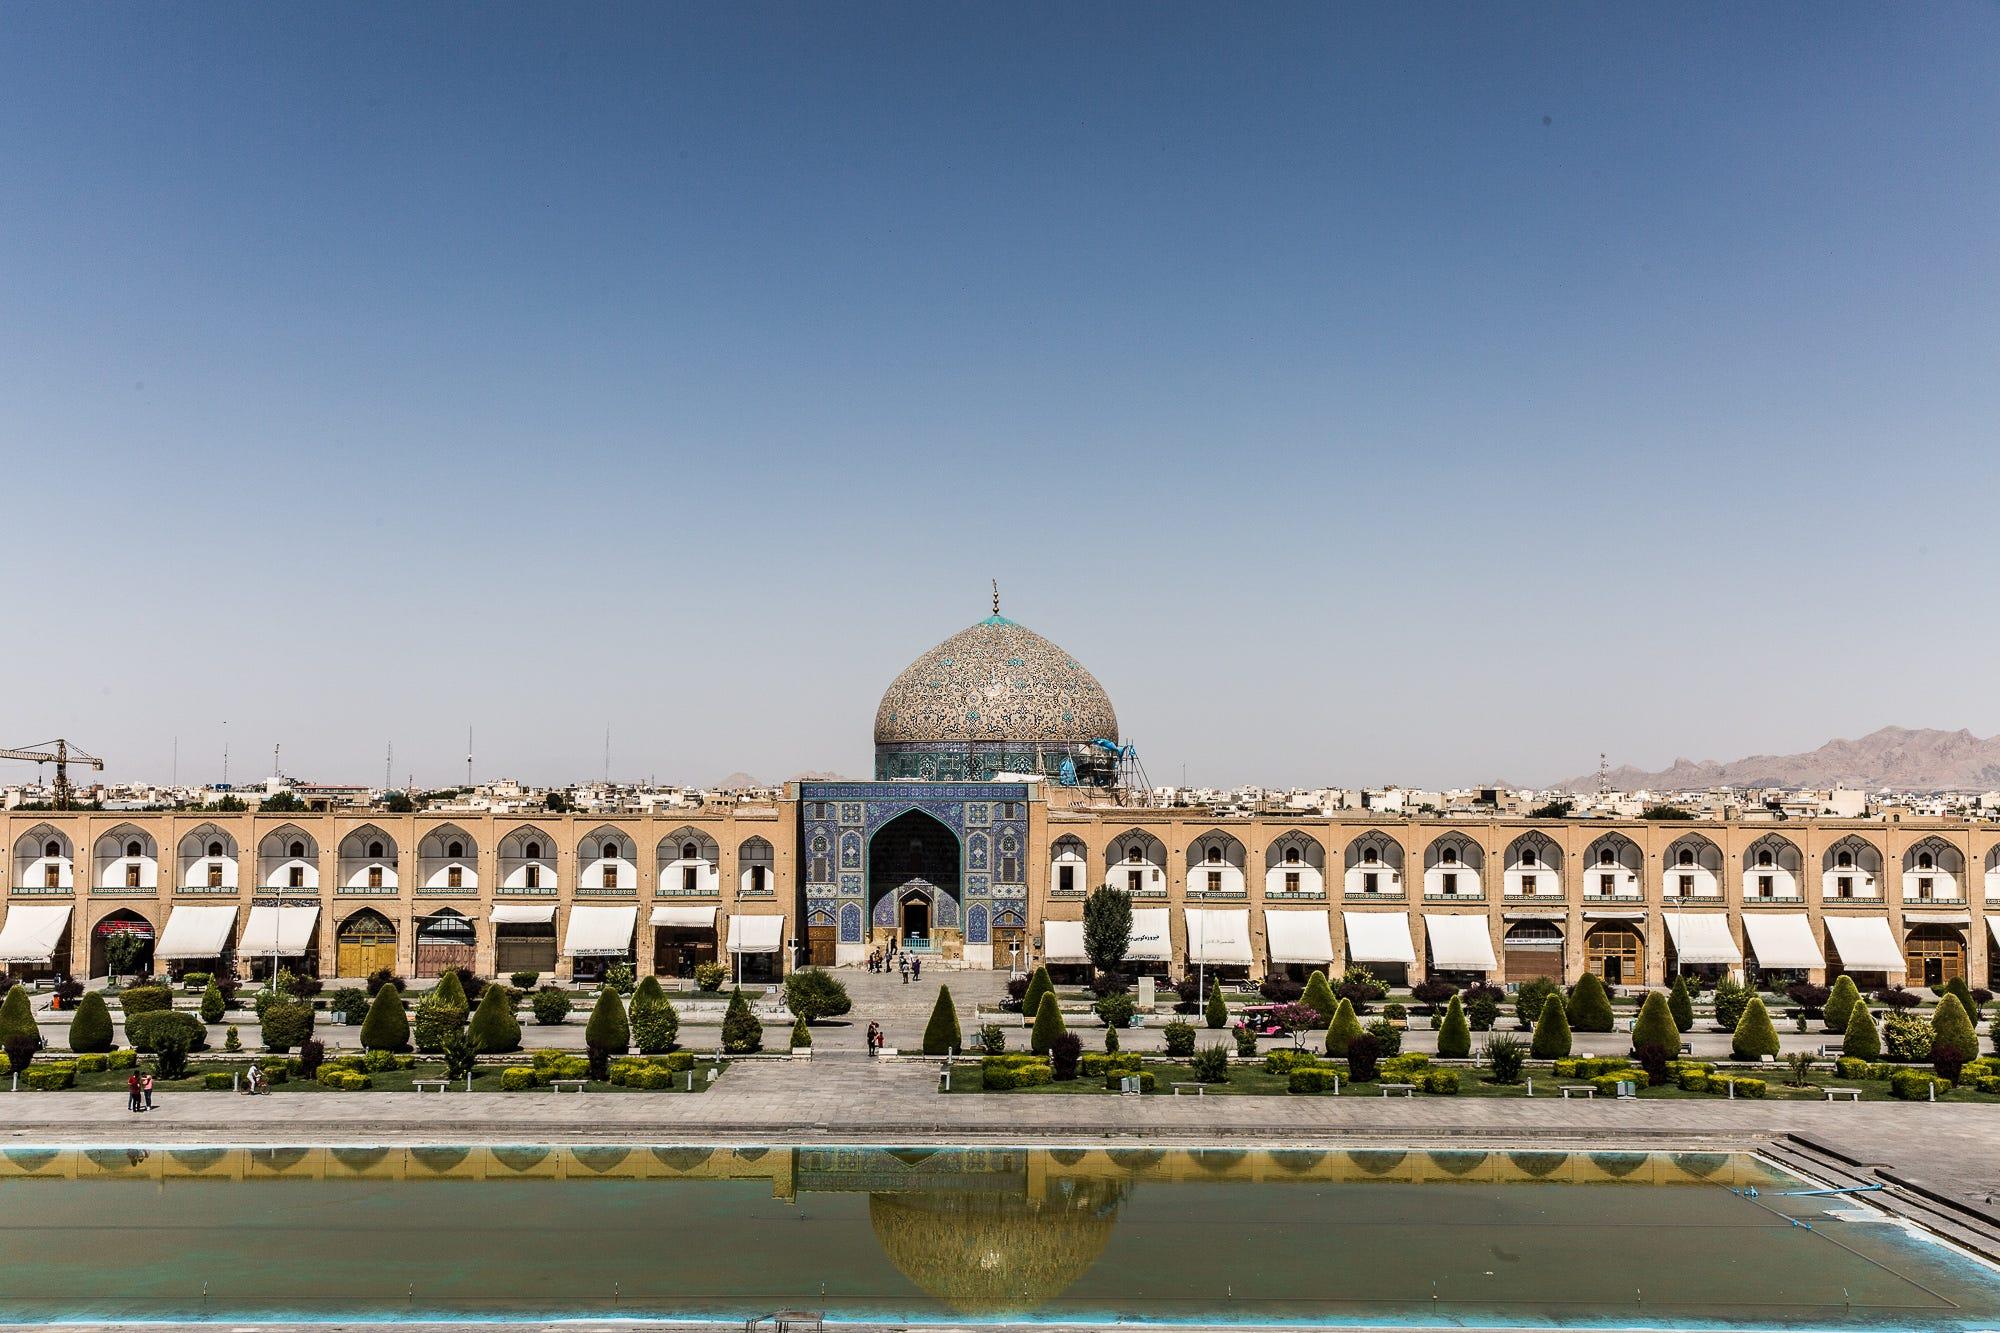 A view of Naqsh-e Jahan Square, in Isfahan, Iran, on July 13, 2018.